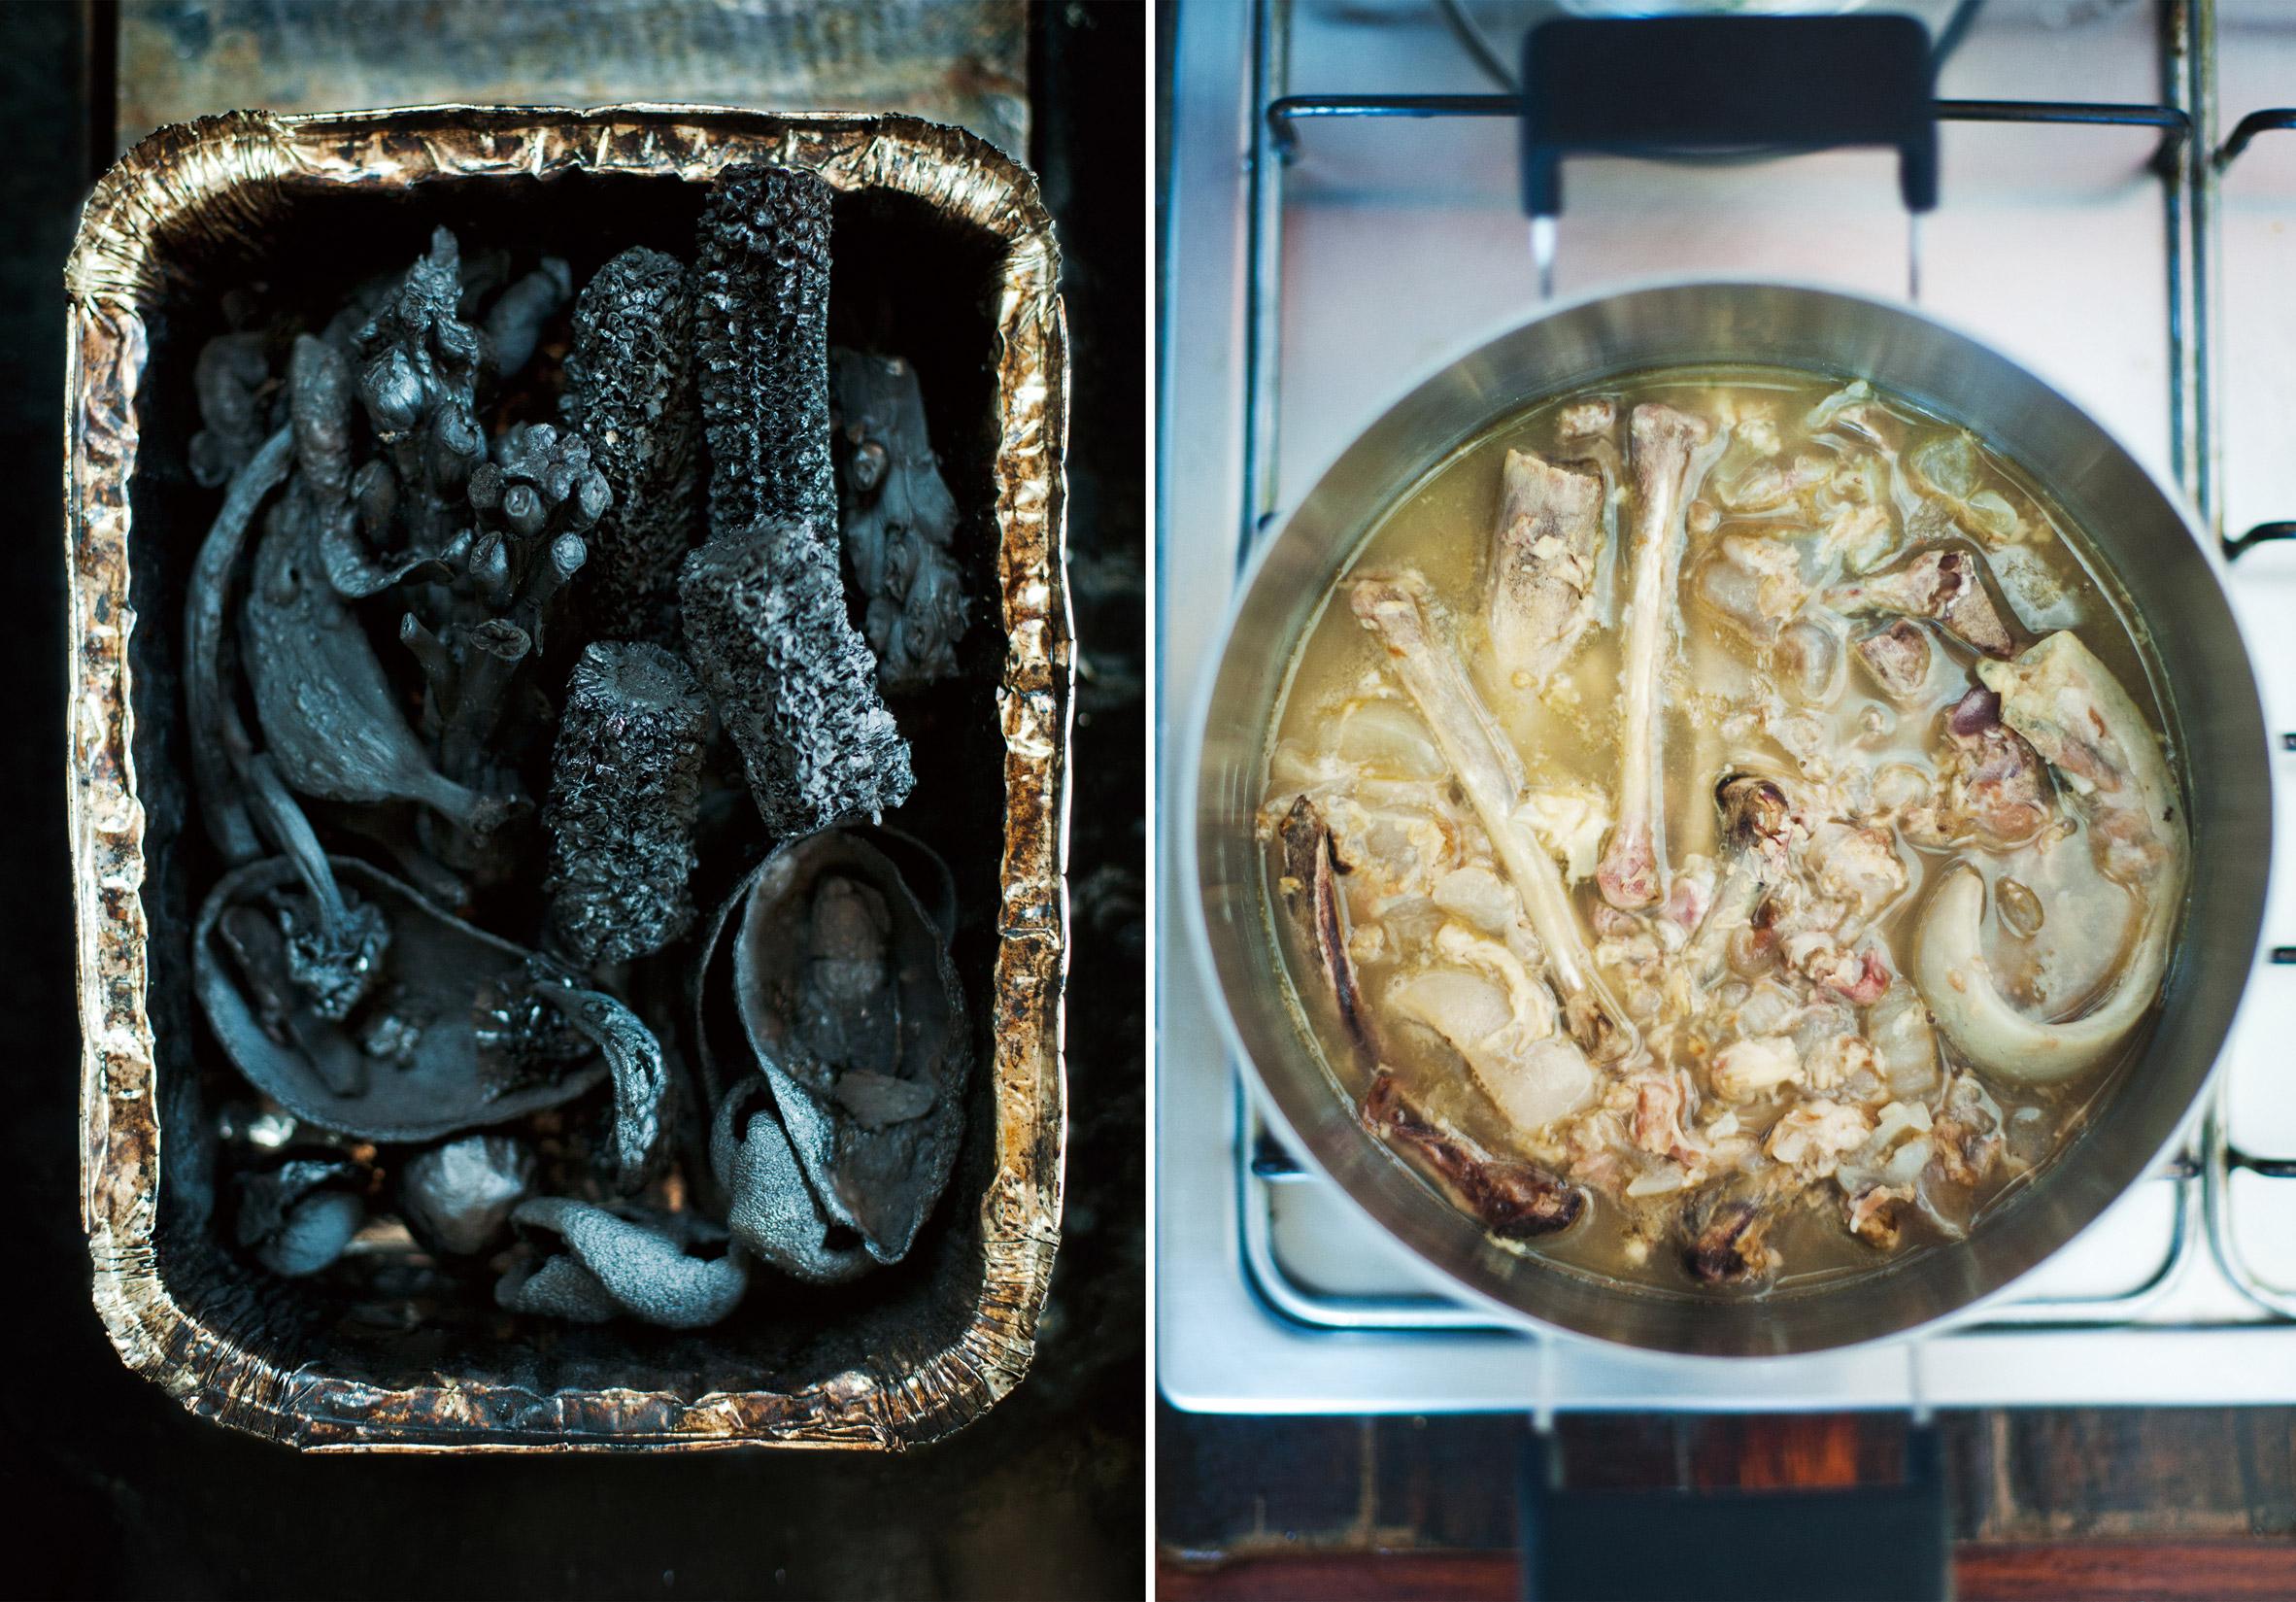 RCA graduate Kosuke Araki has created a range of tableware from recycled food waste.